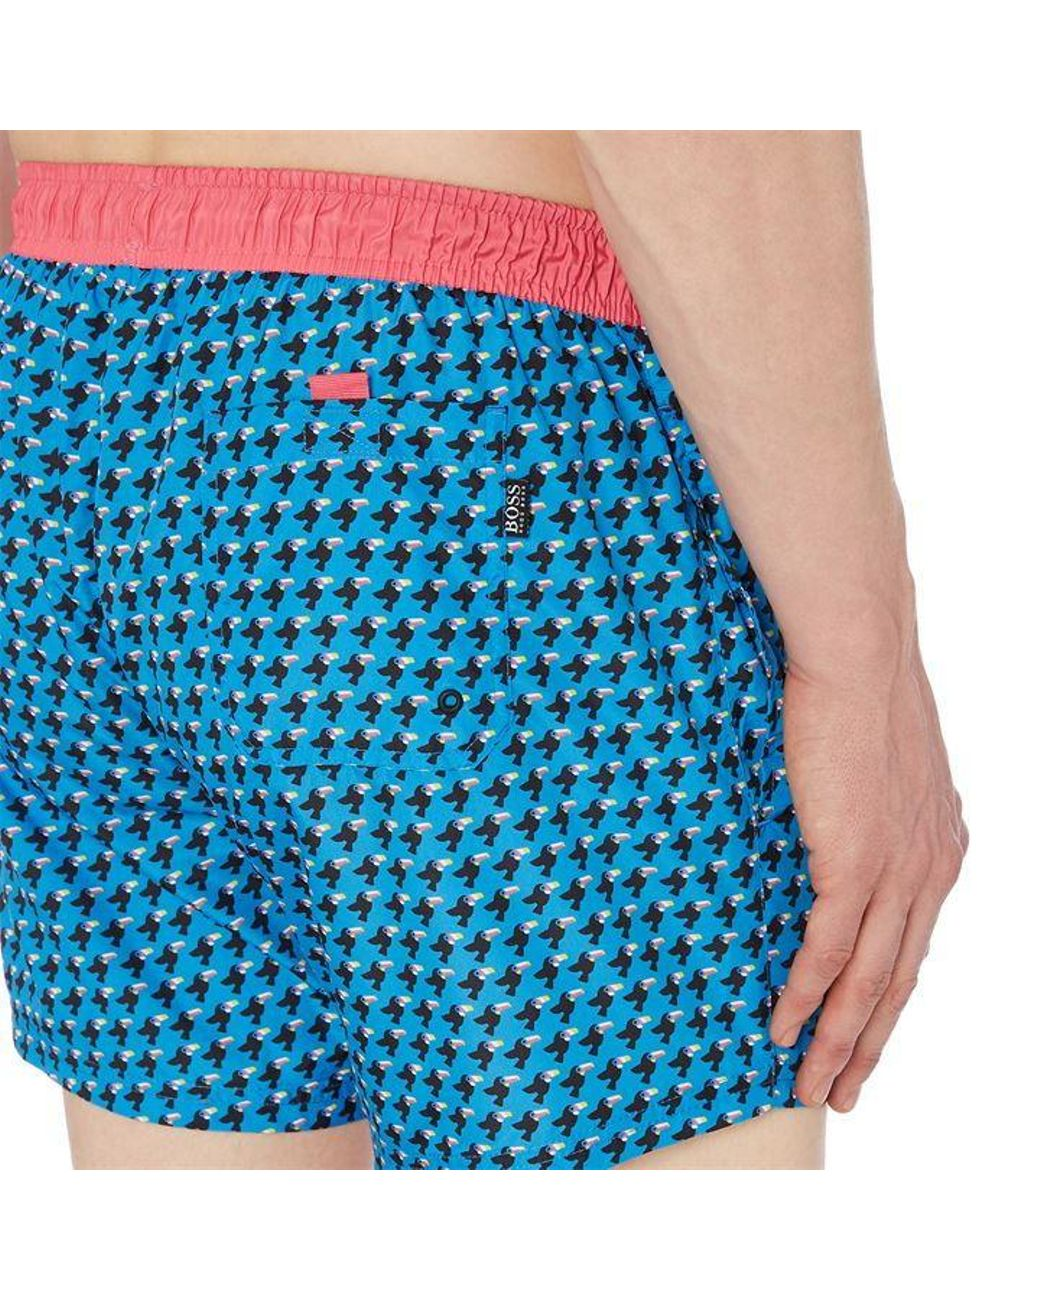 Hugo Boss Men/'s Cardinalfish Quick Dry Open Blue Trunks Shorts Swimwear